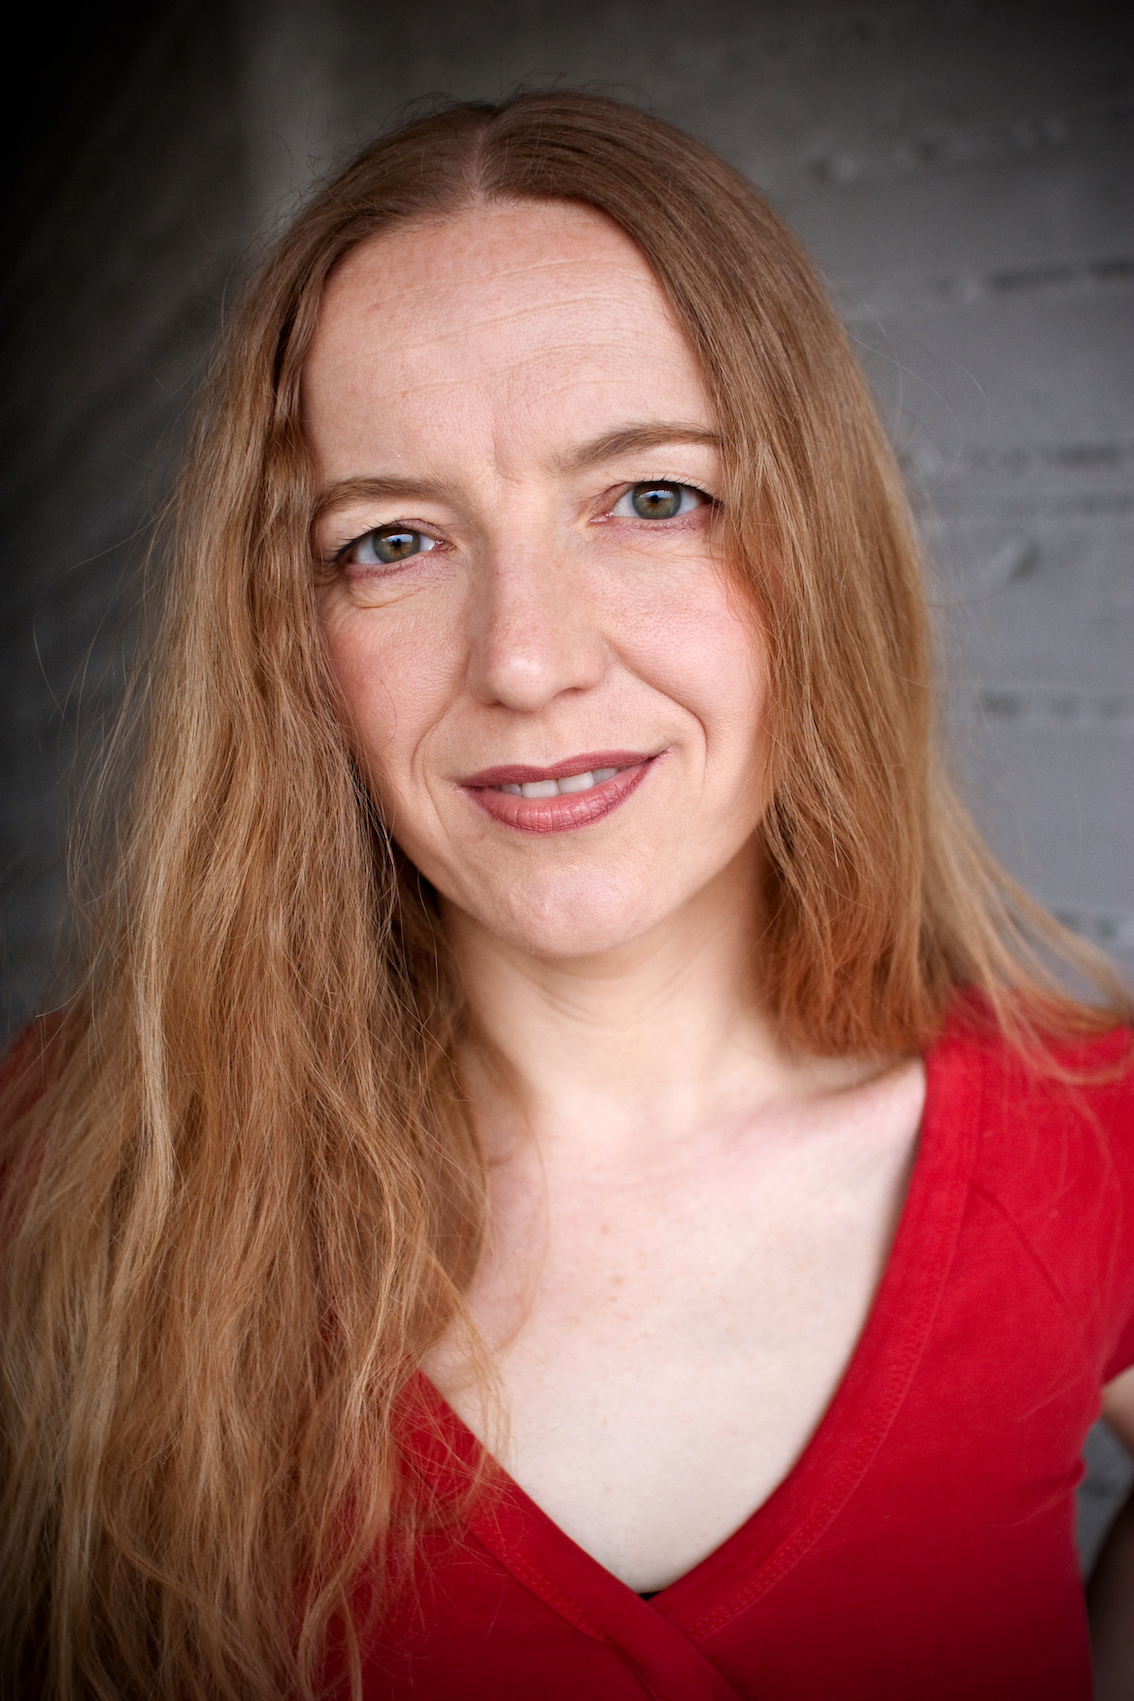 Silke Rosenbusch